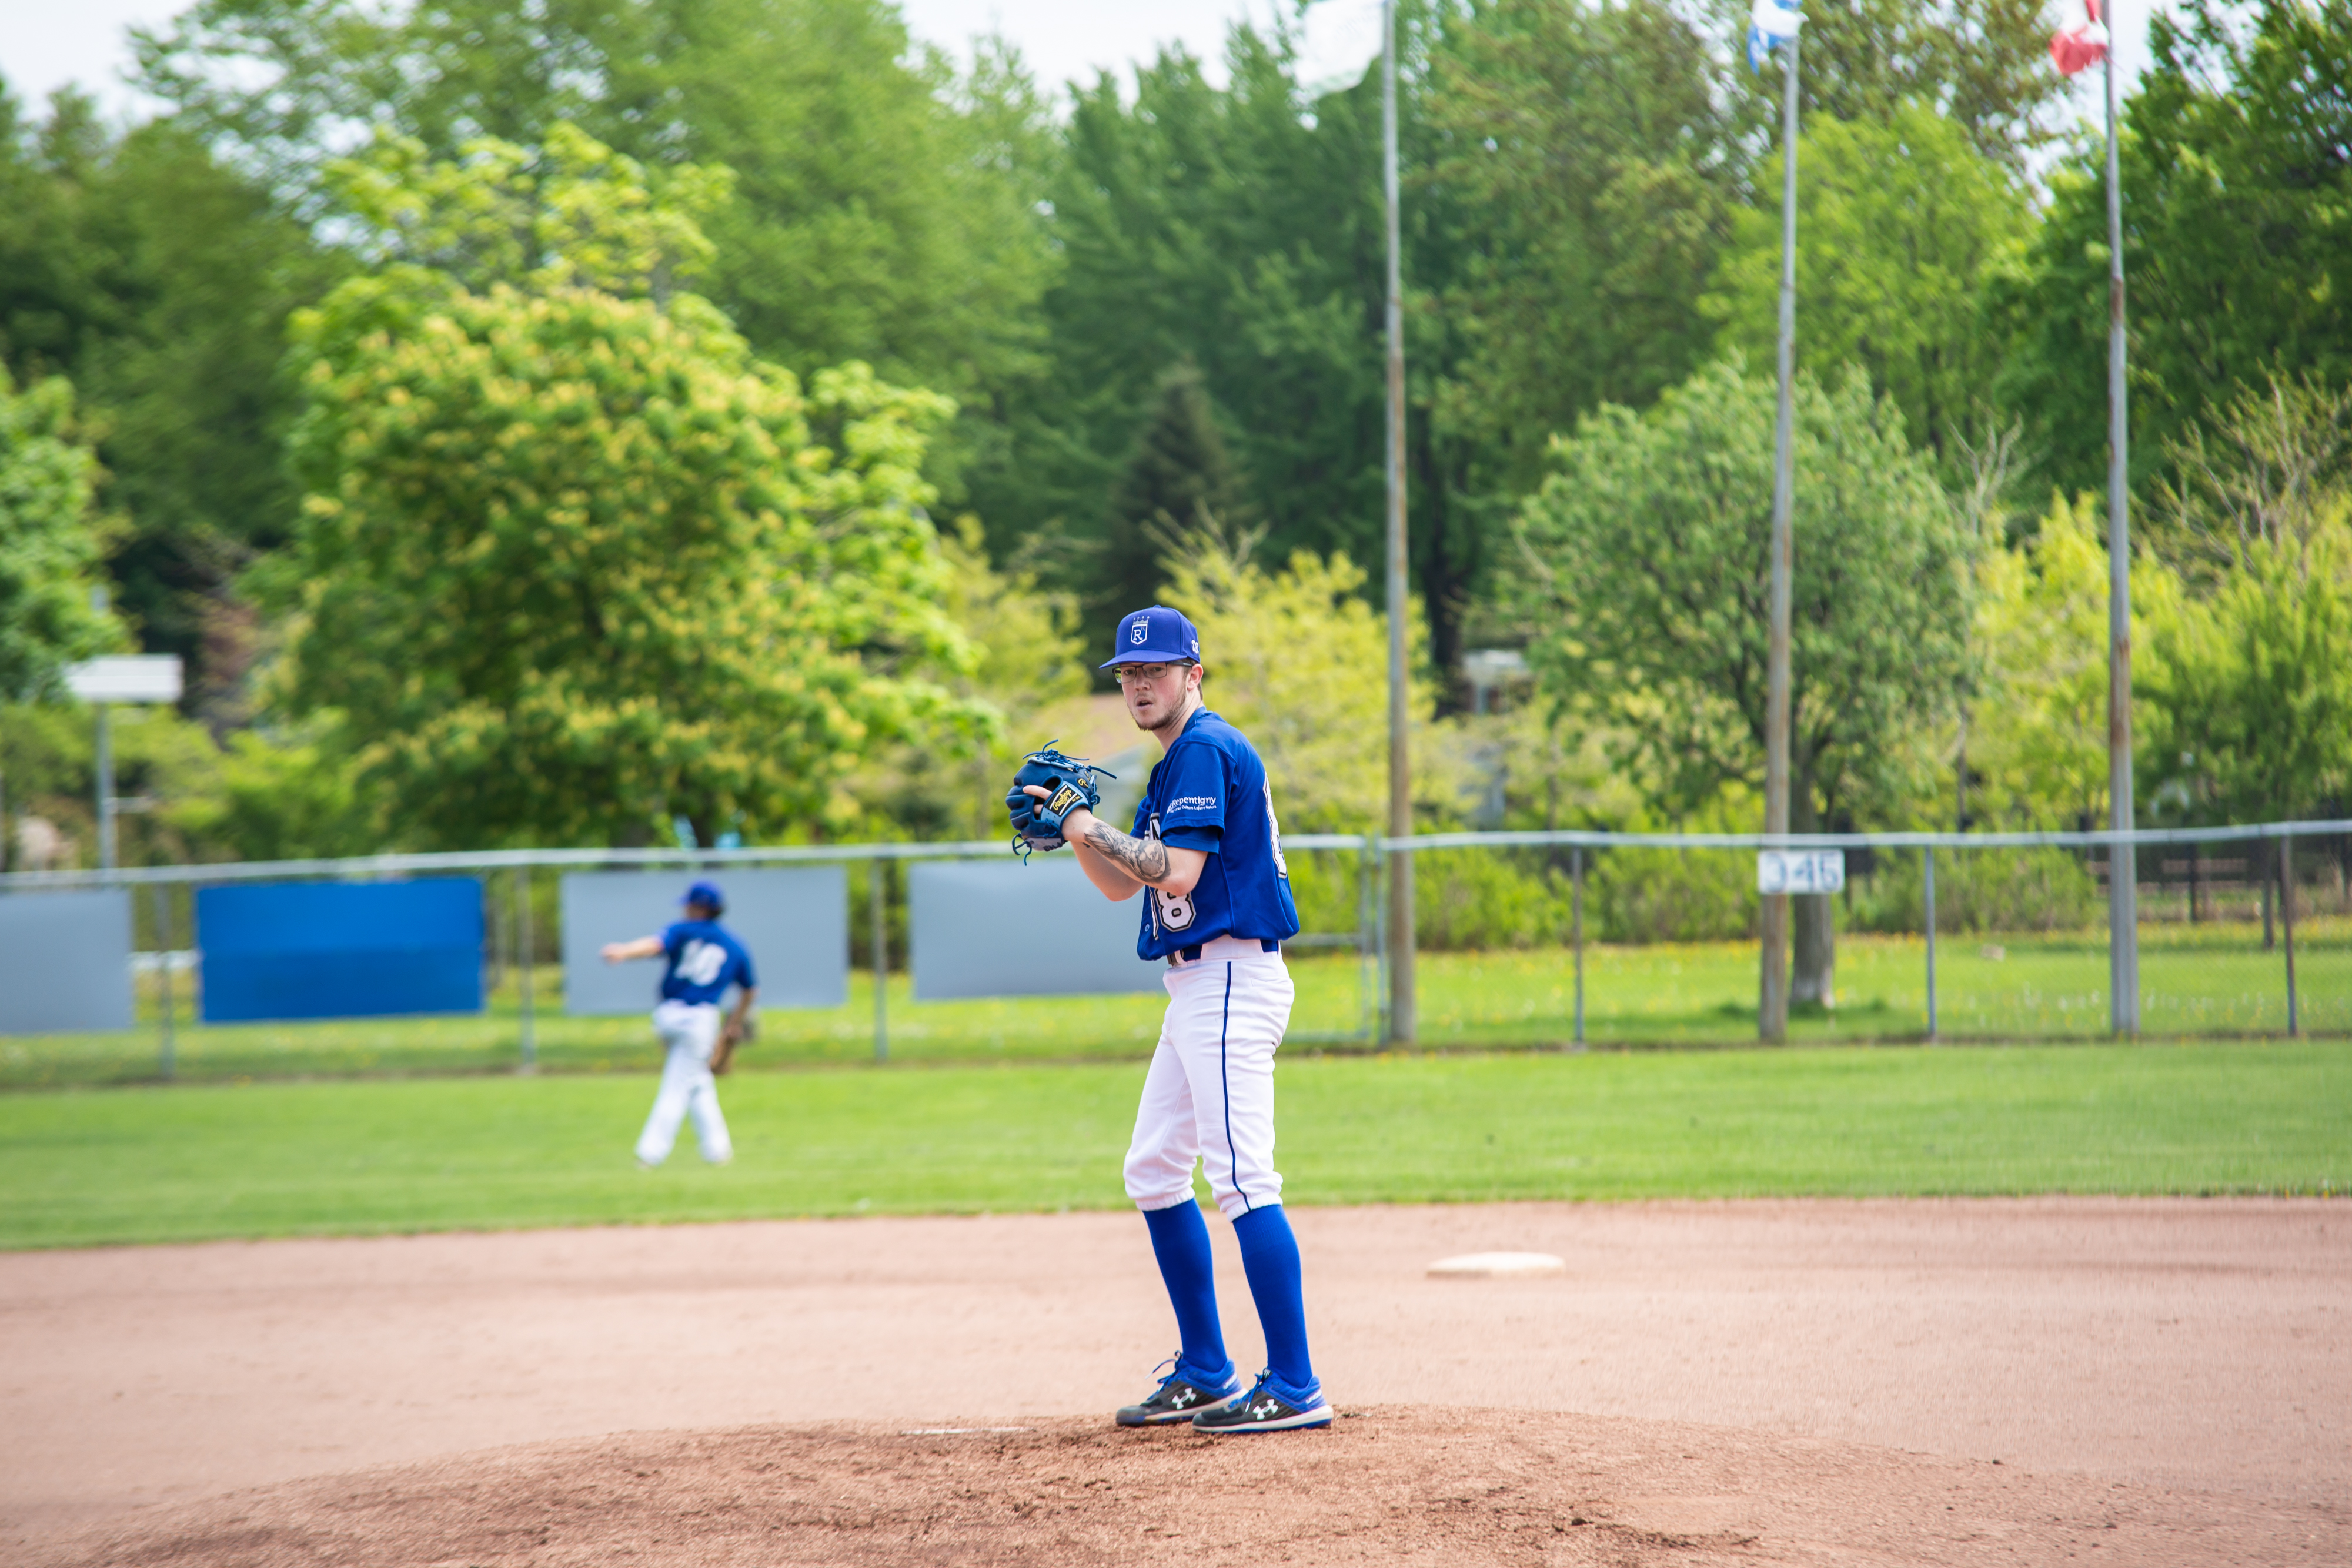 Royal baseball